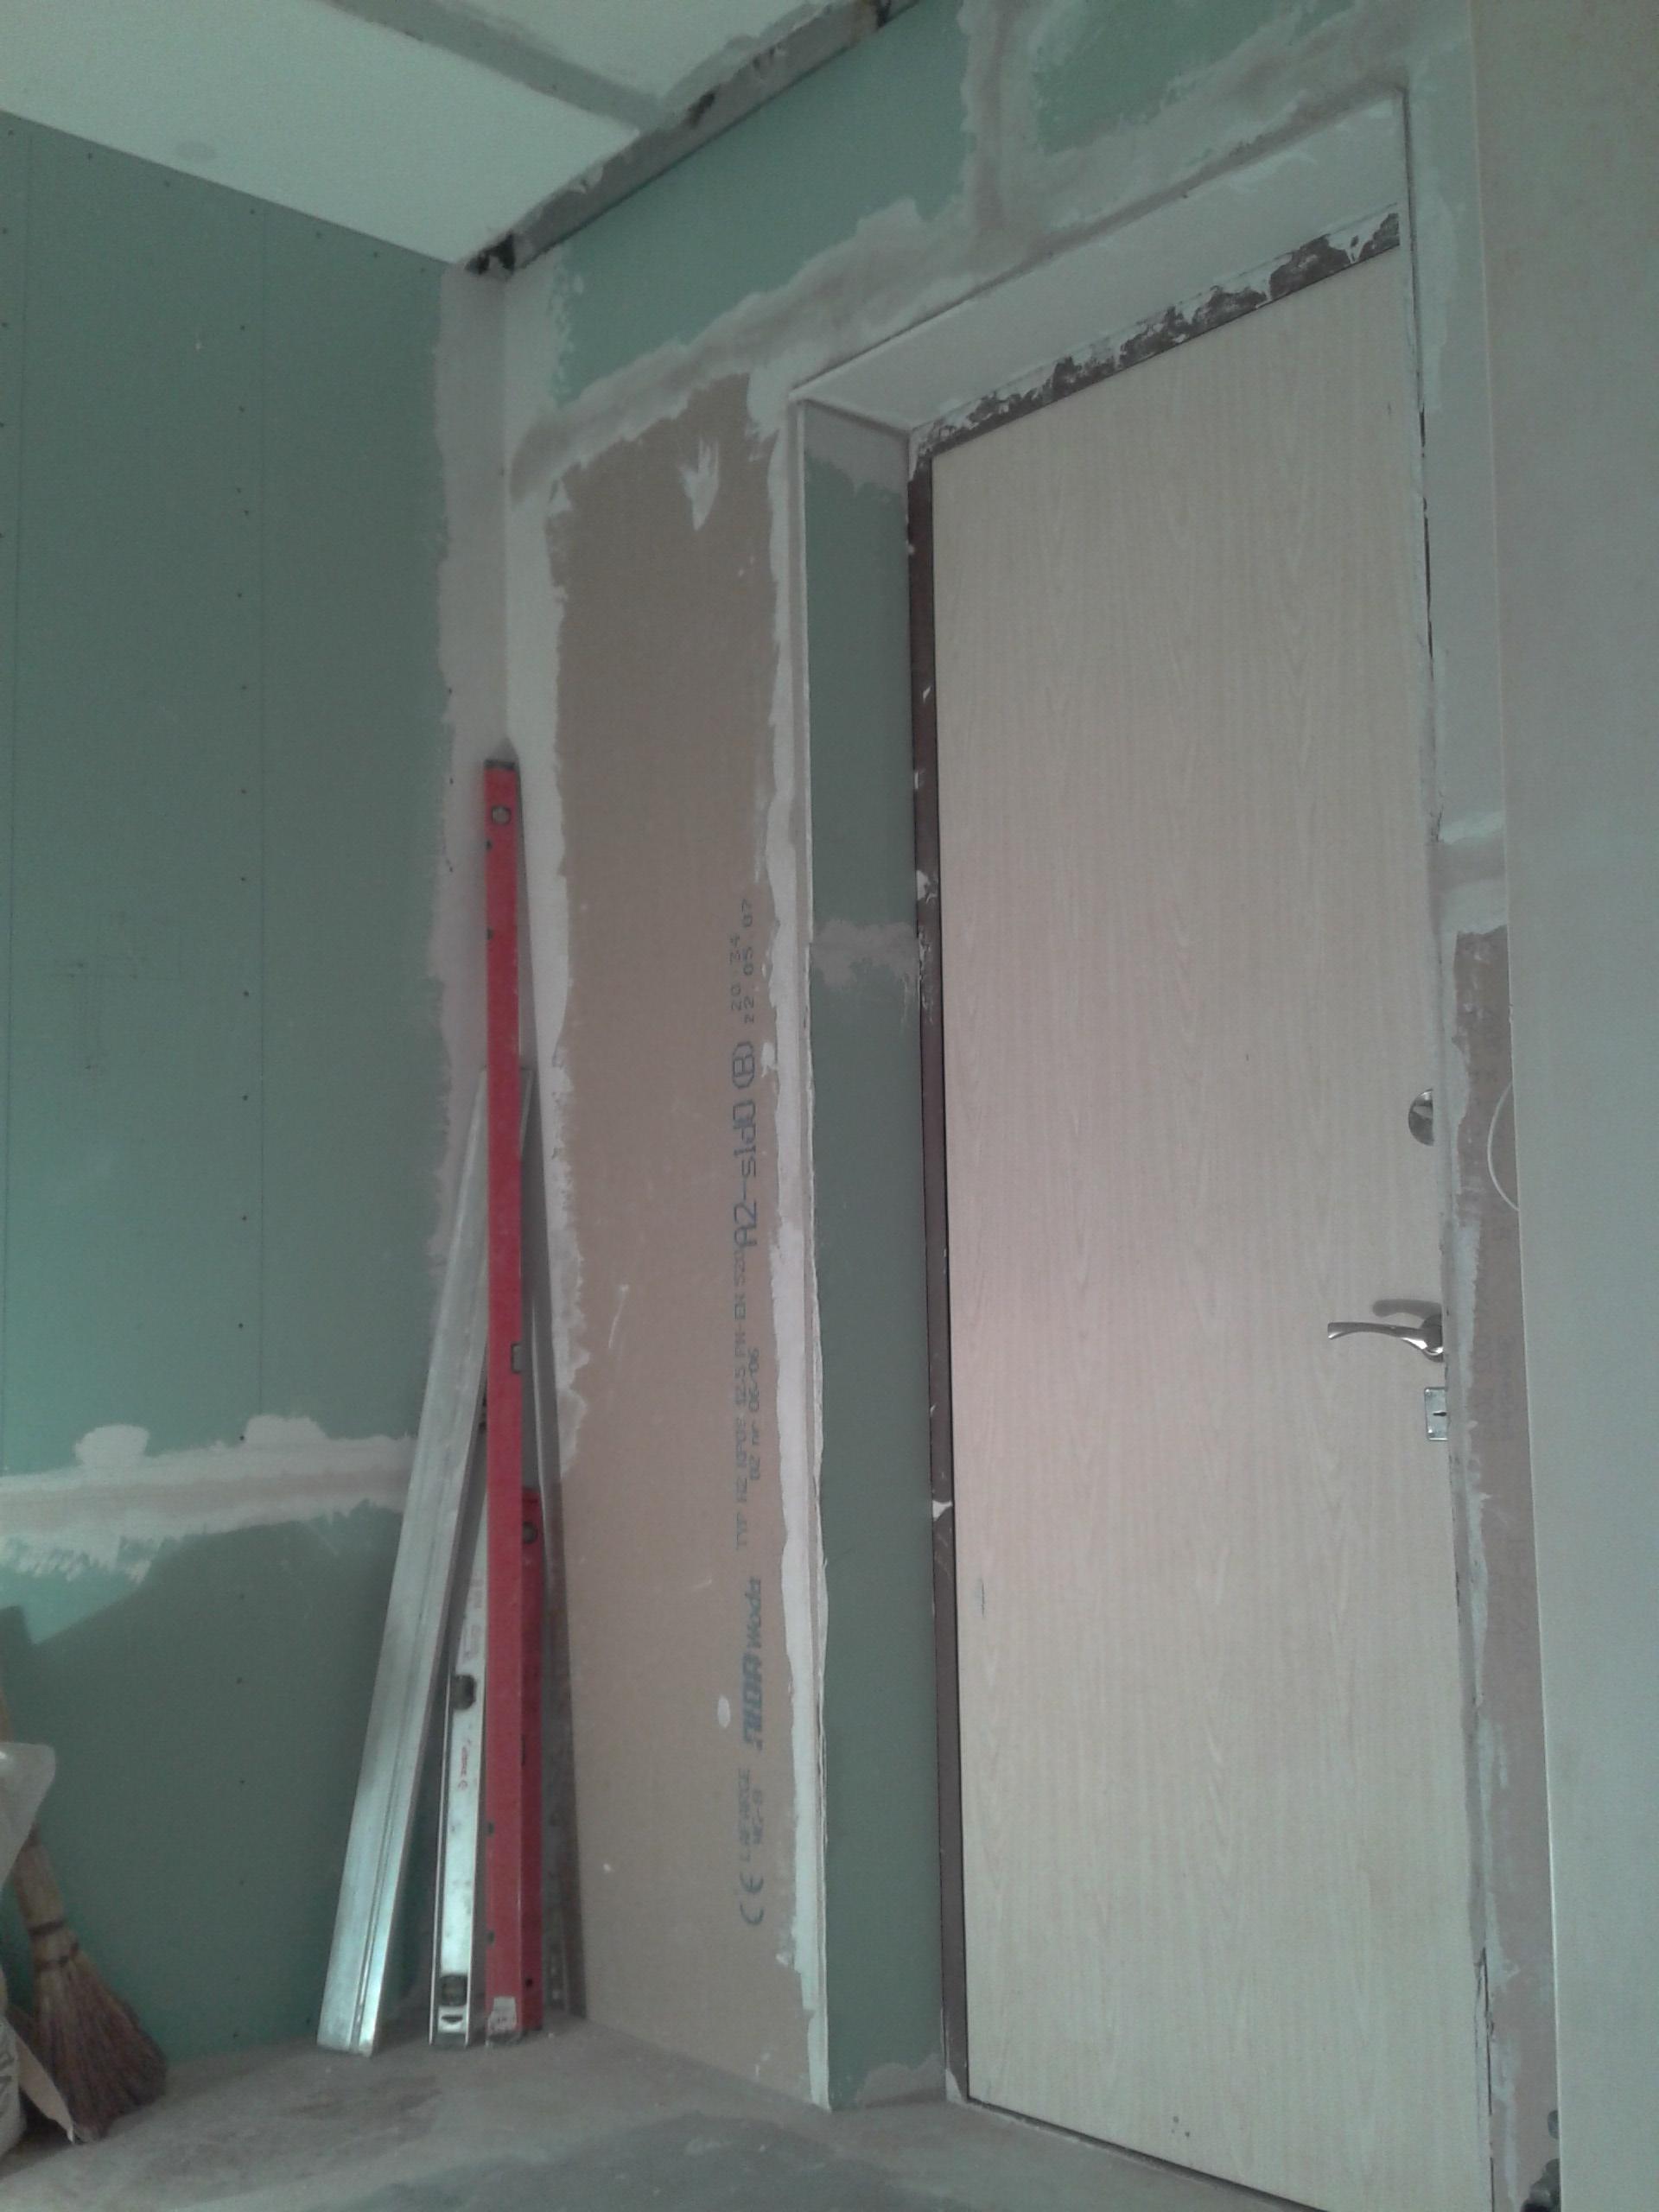 Фото Монтаж перегородки меж коридором и вх в квартиру, монтаж плитки, обои и т.д. - 2 мес.